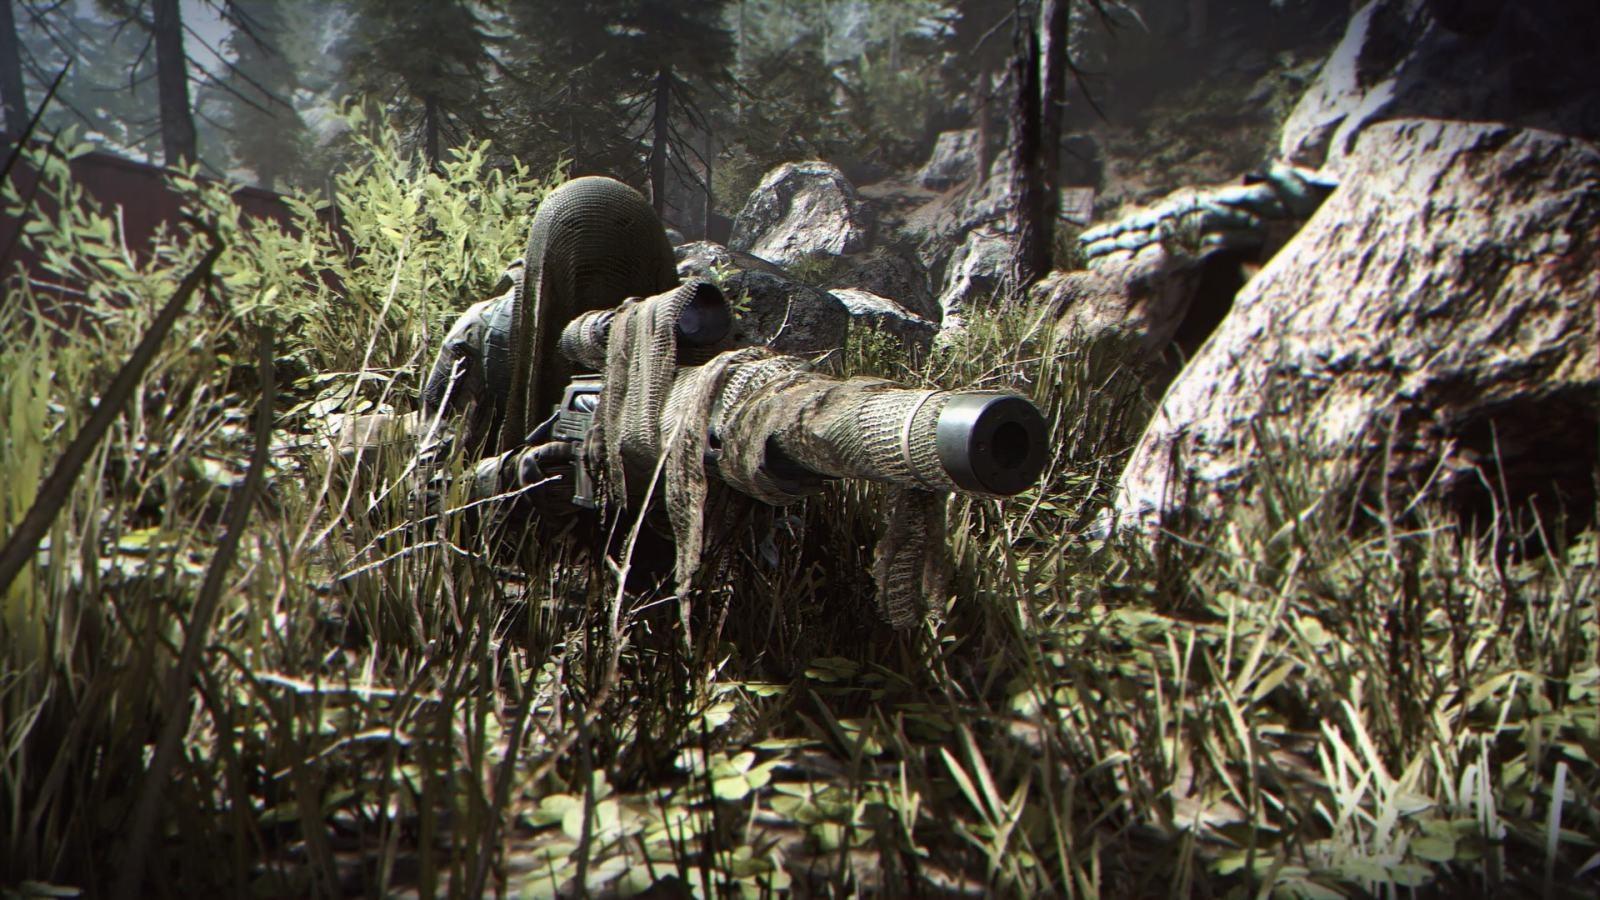 Call of Duty: Modern Warfare; wallpaper: sniper